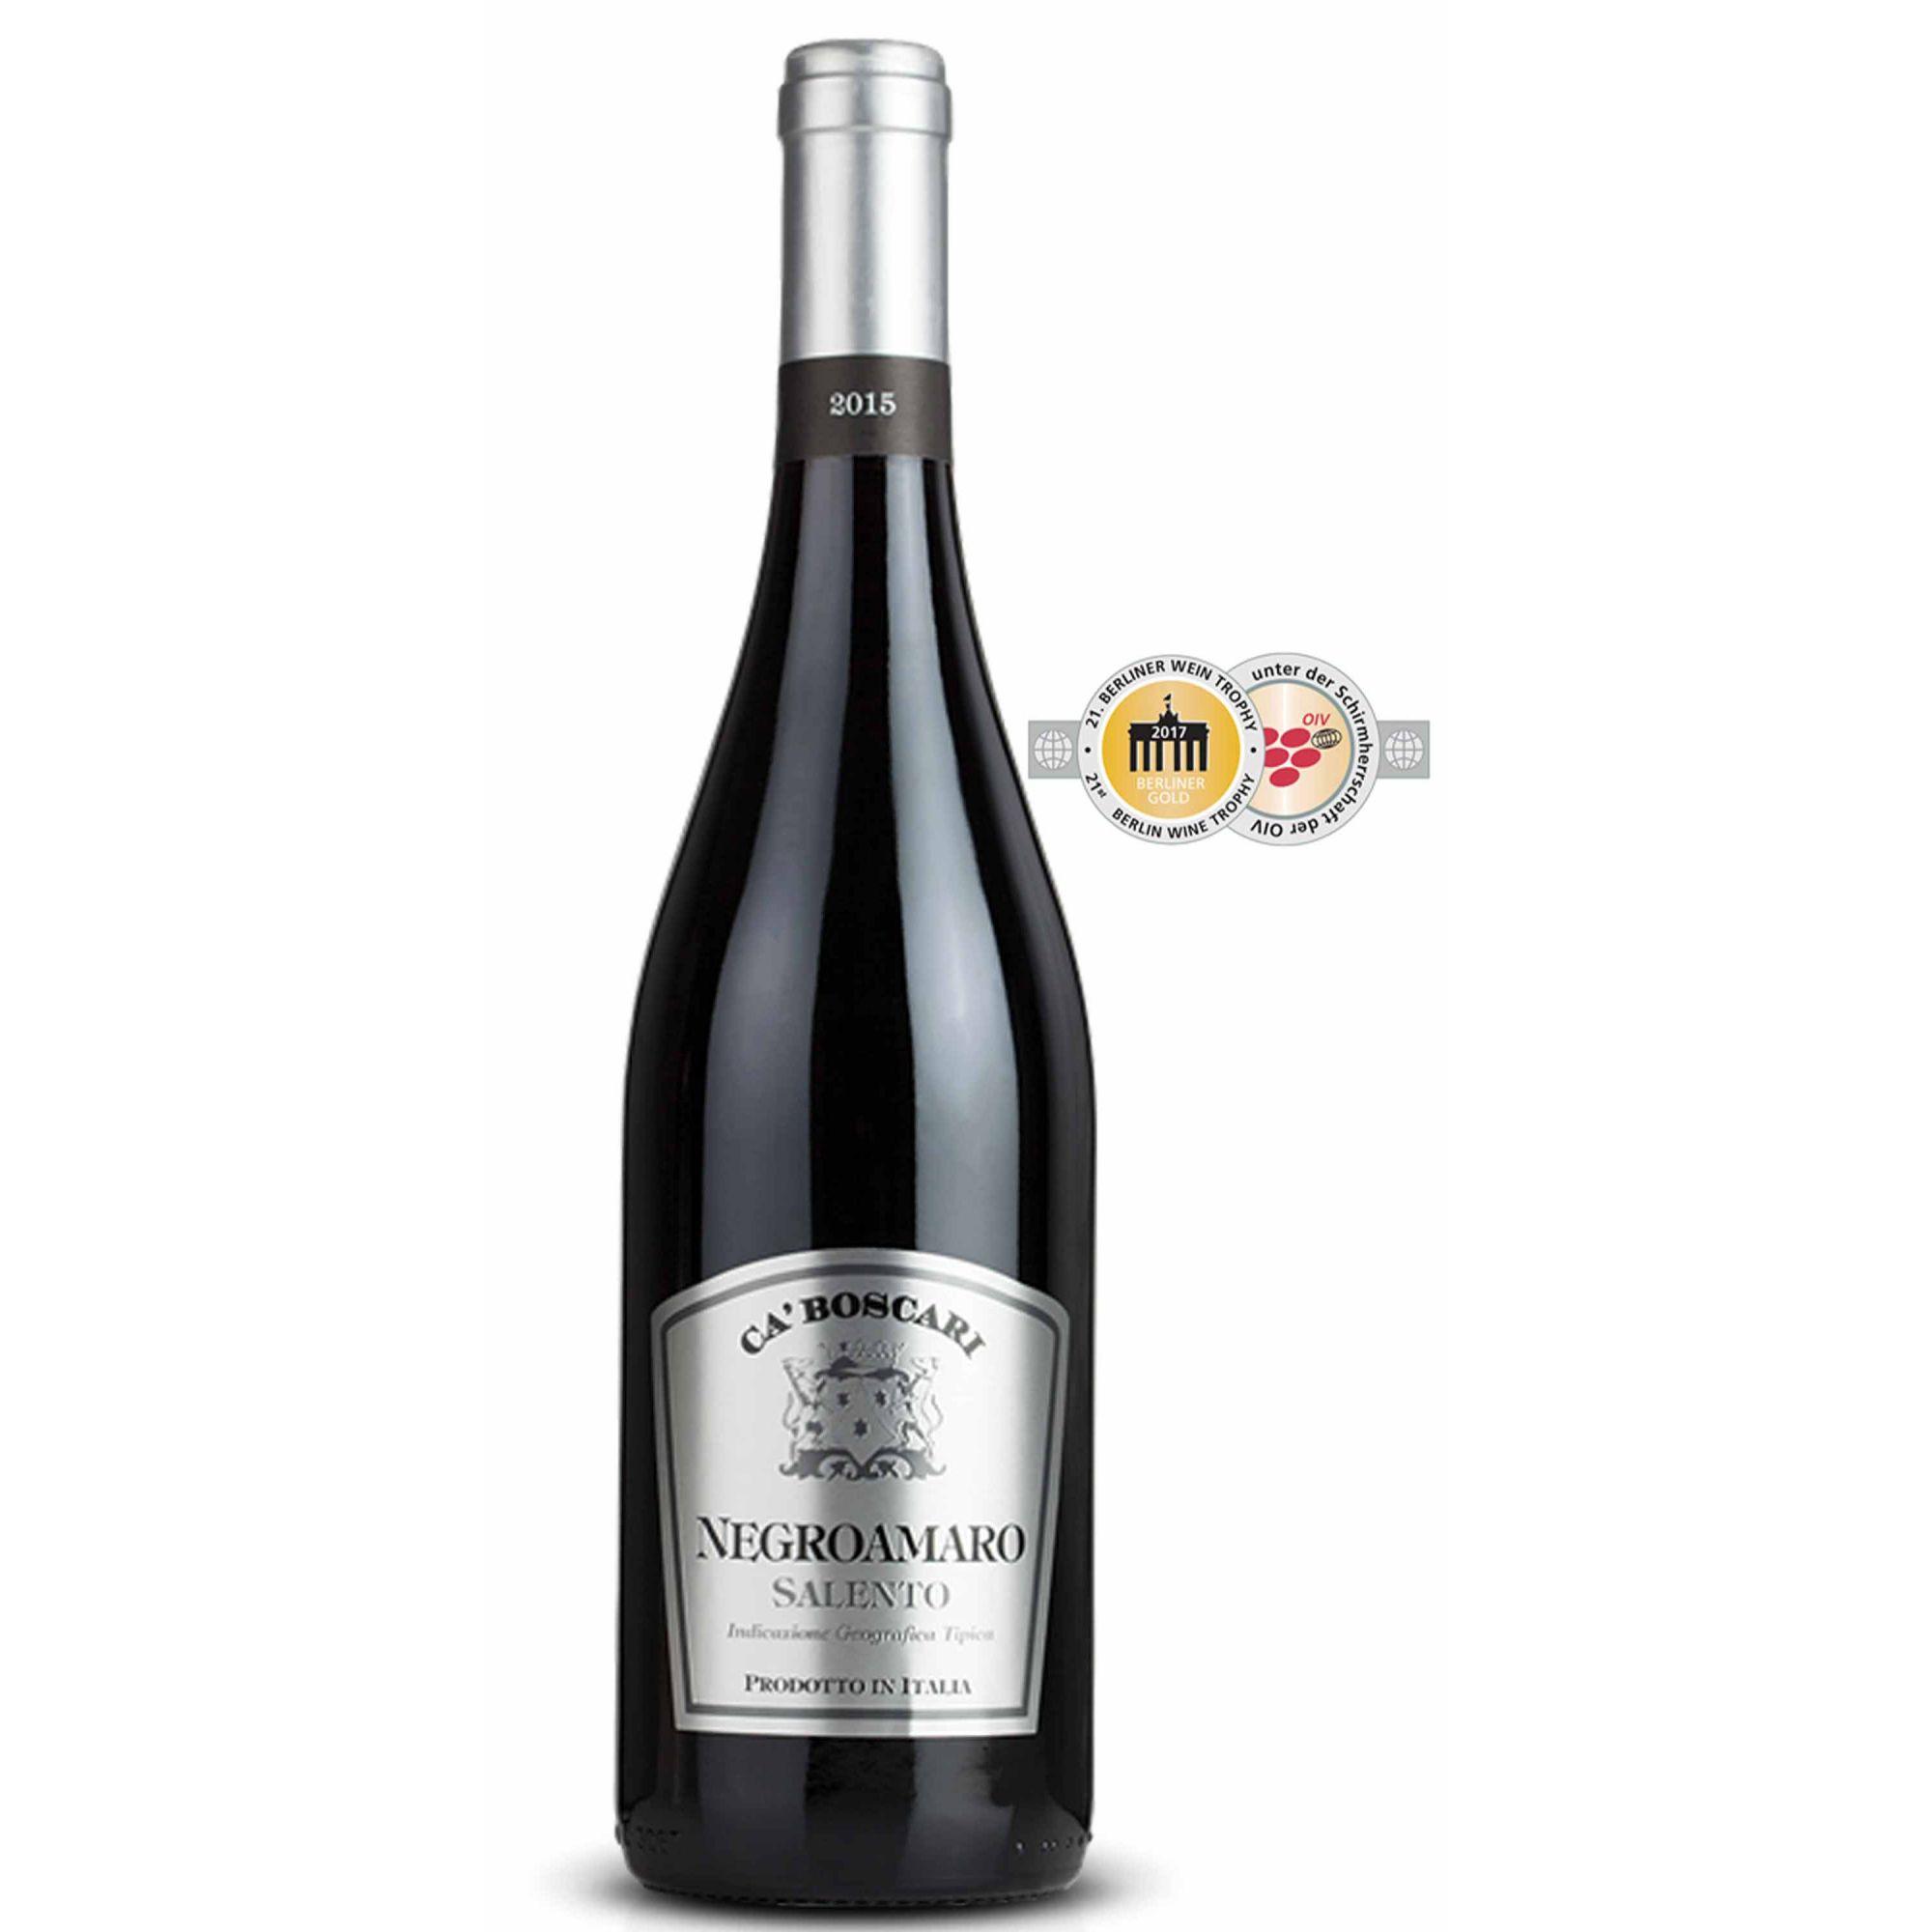 Vinho Ca'Boscari Negroamaro Salento IGT